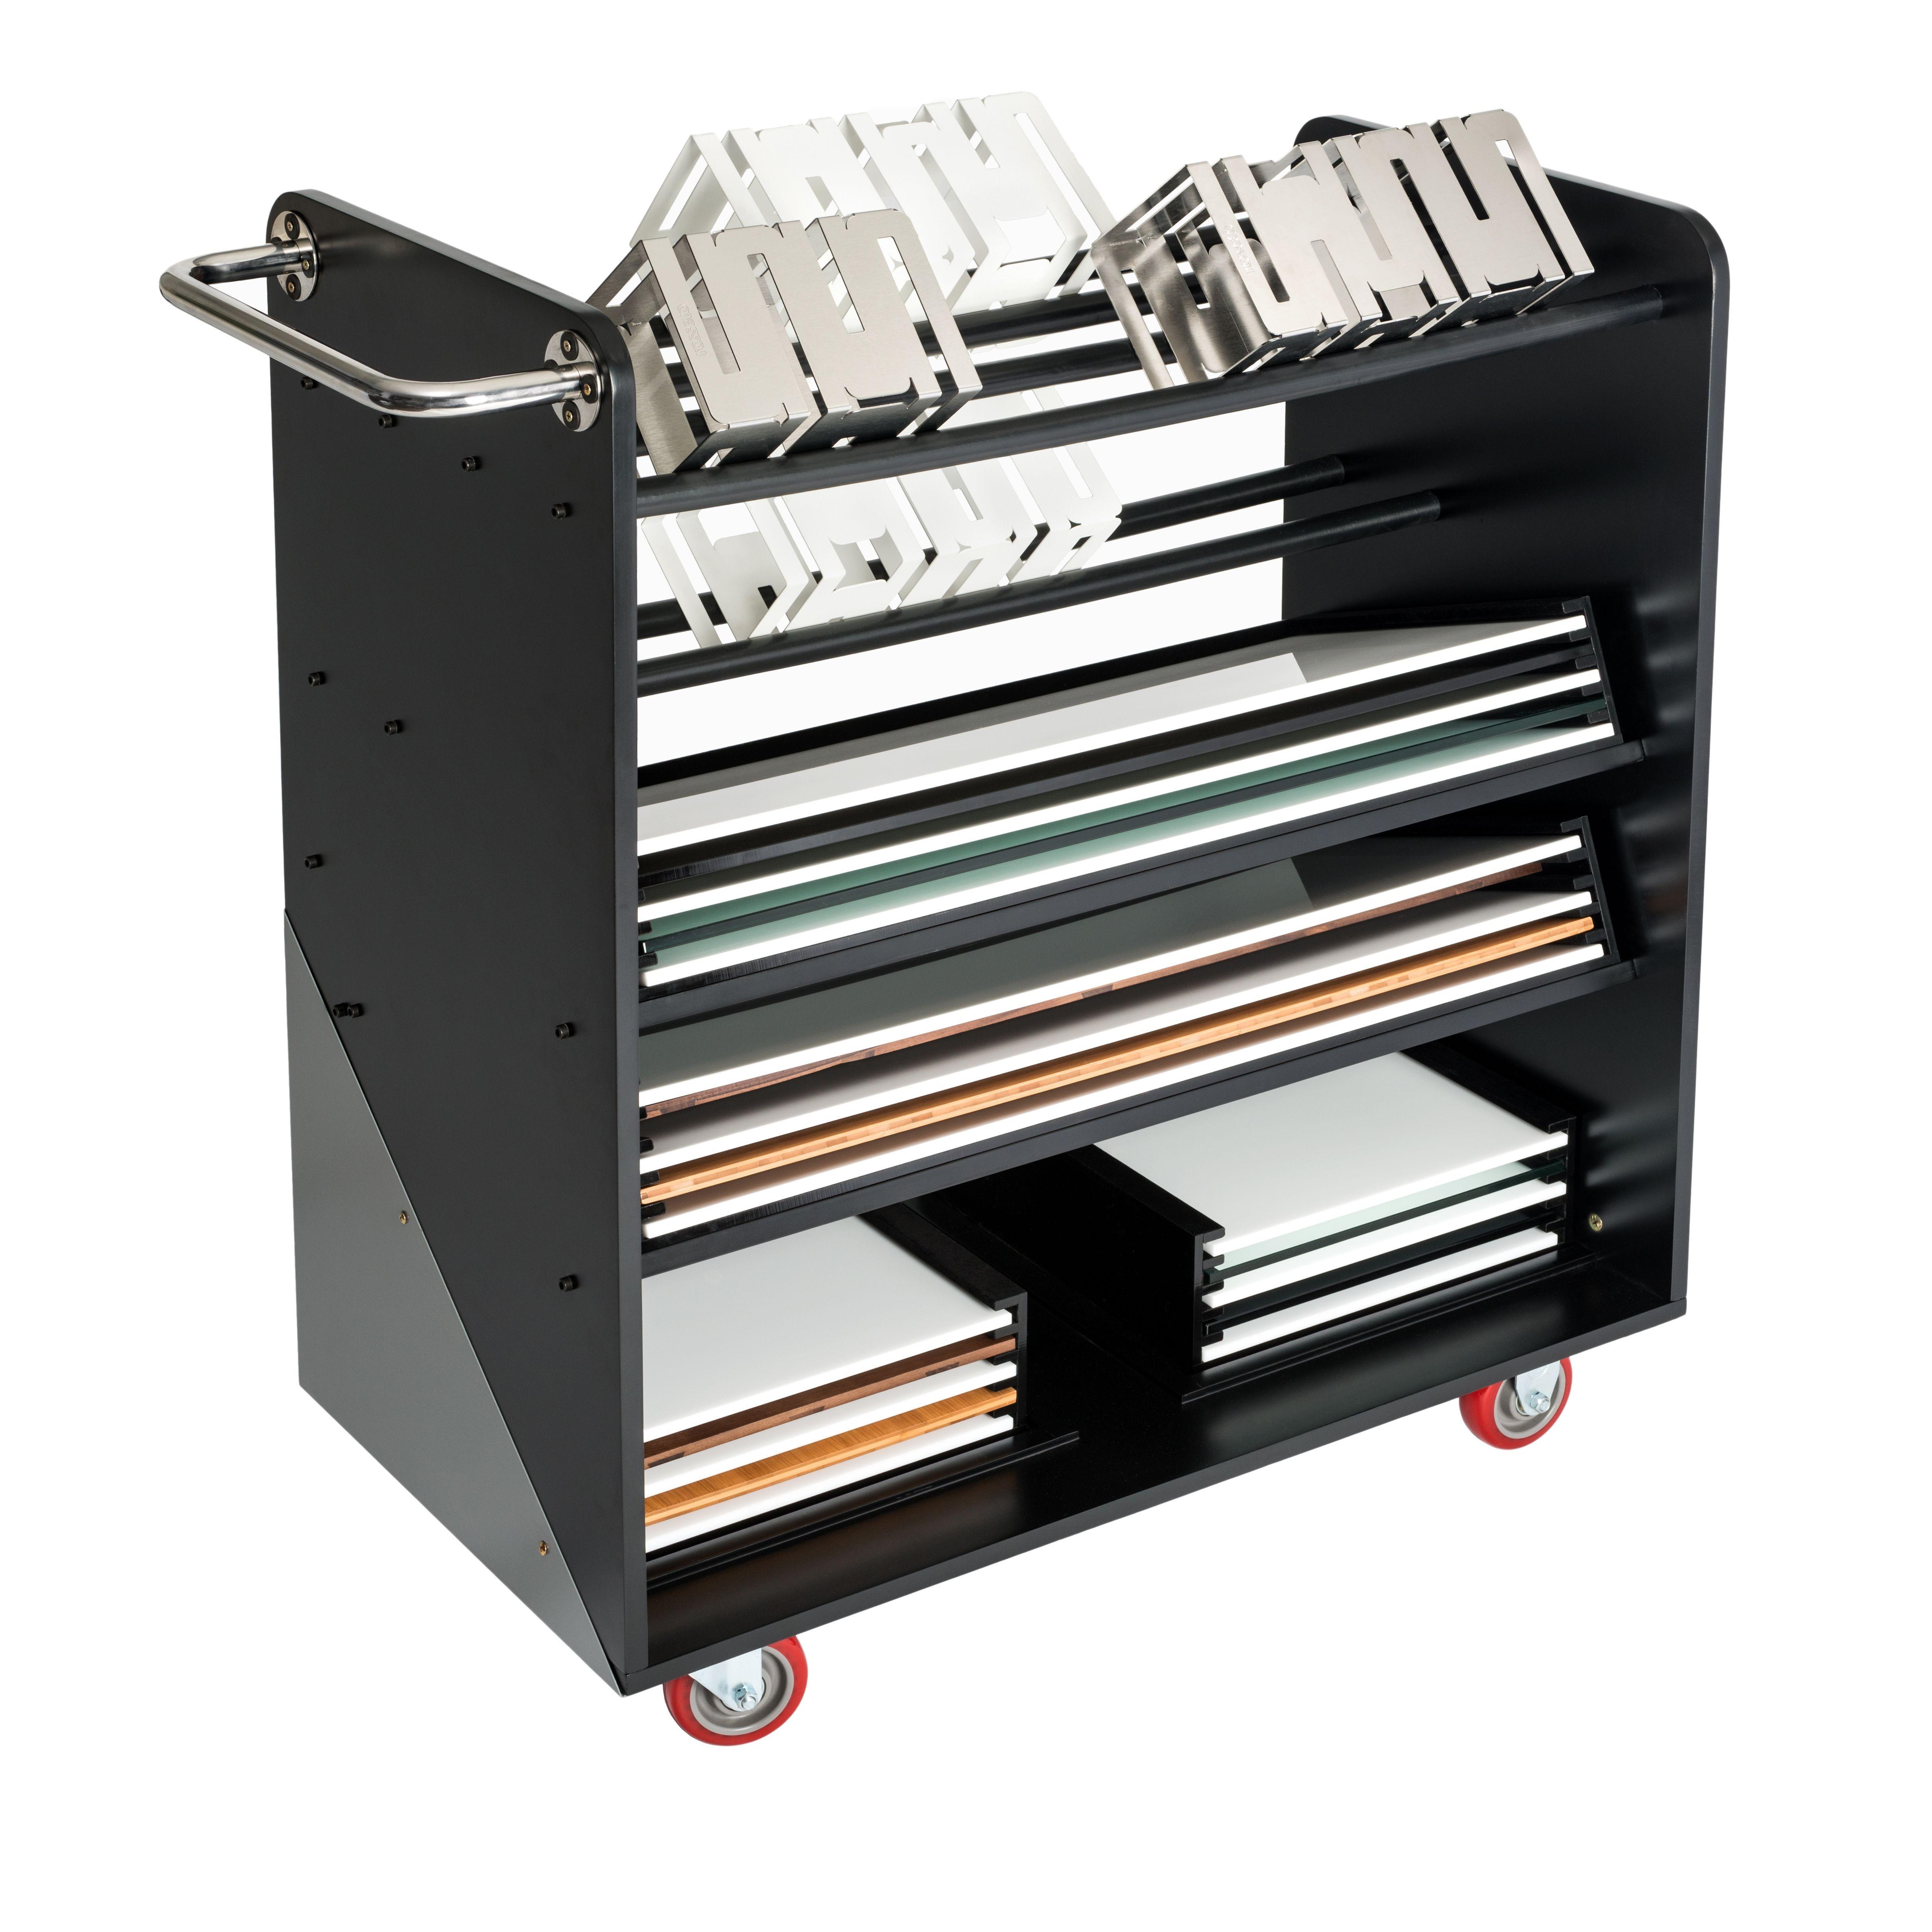 "Rosseto SM132 SKYCAP Multi-Level Riser Transportation & Storage Cart with Wheels 42"" x 19.25"" x 40""H"